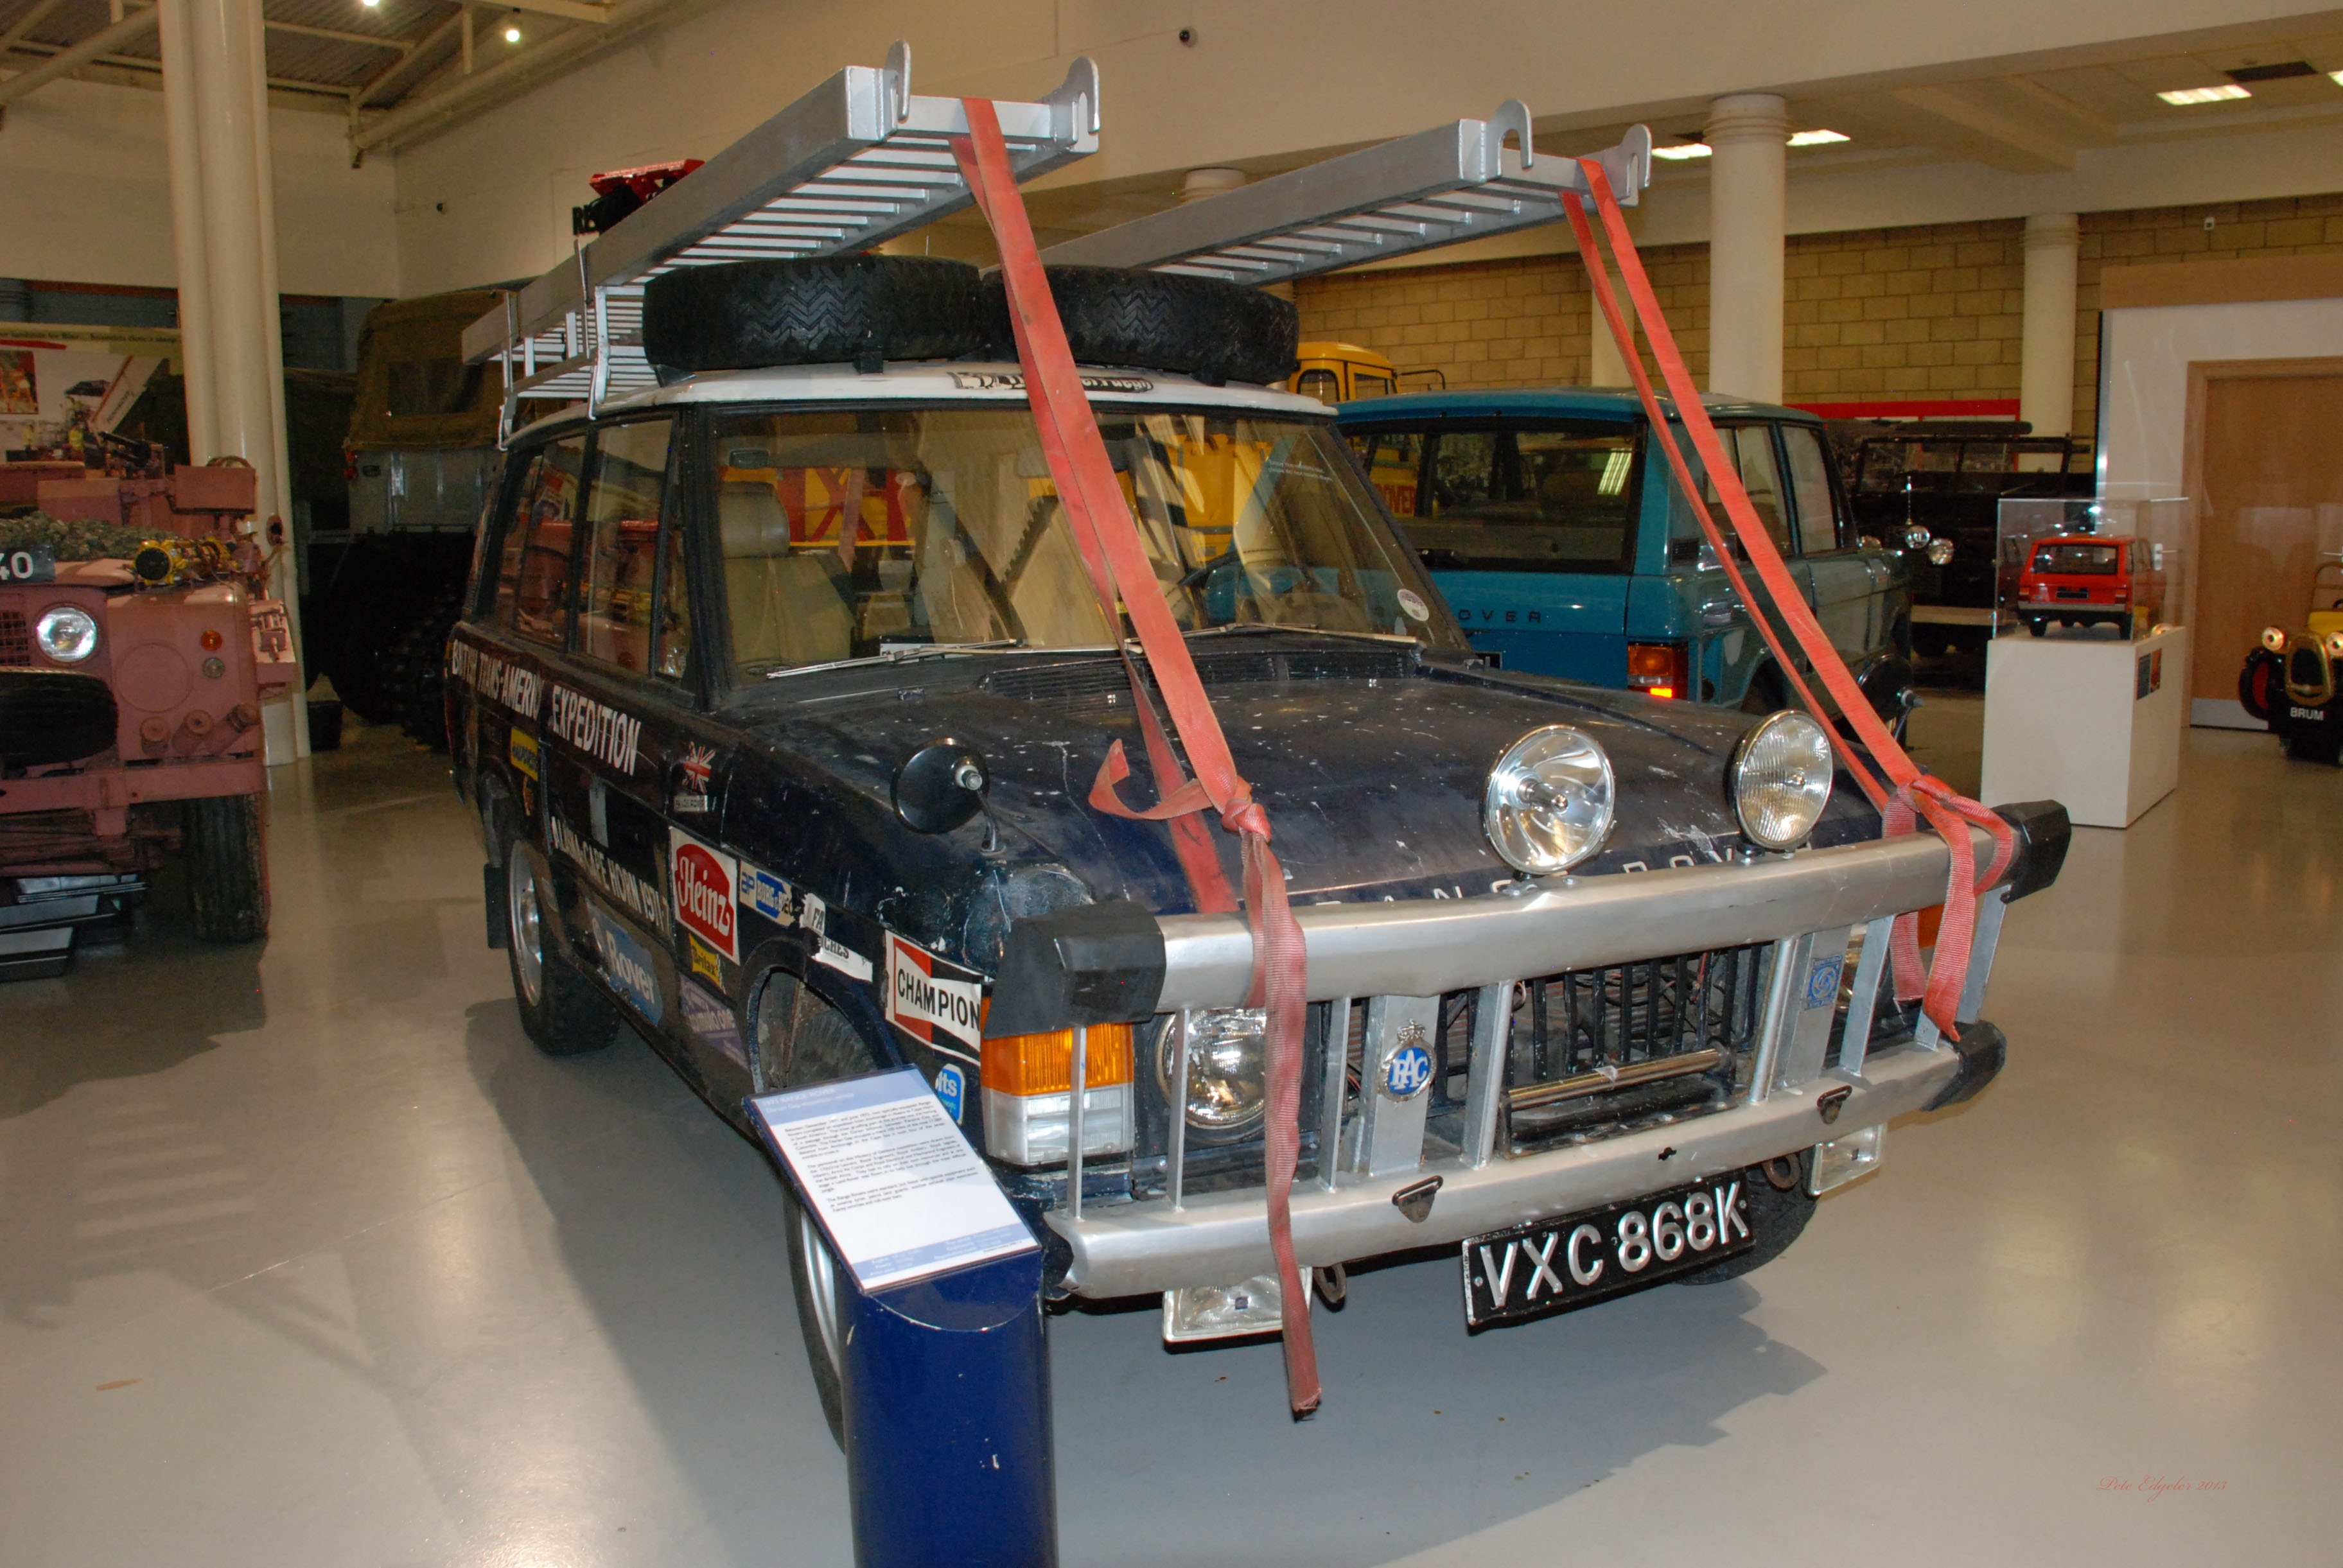 vxc868k 1971 range rover darien gap expedition vehicle flickr photo sharing. Black Bedroom Furniture Sets. Home Design Ideas